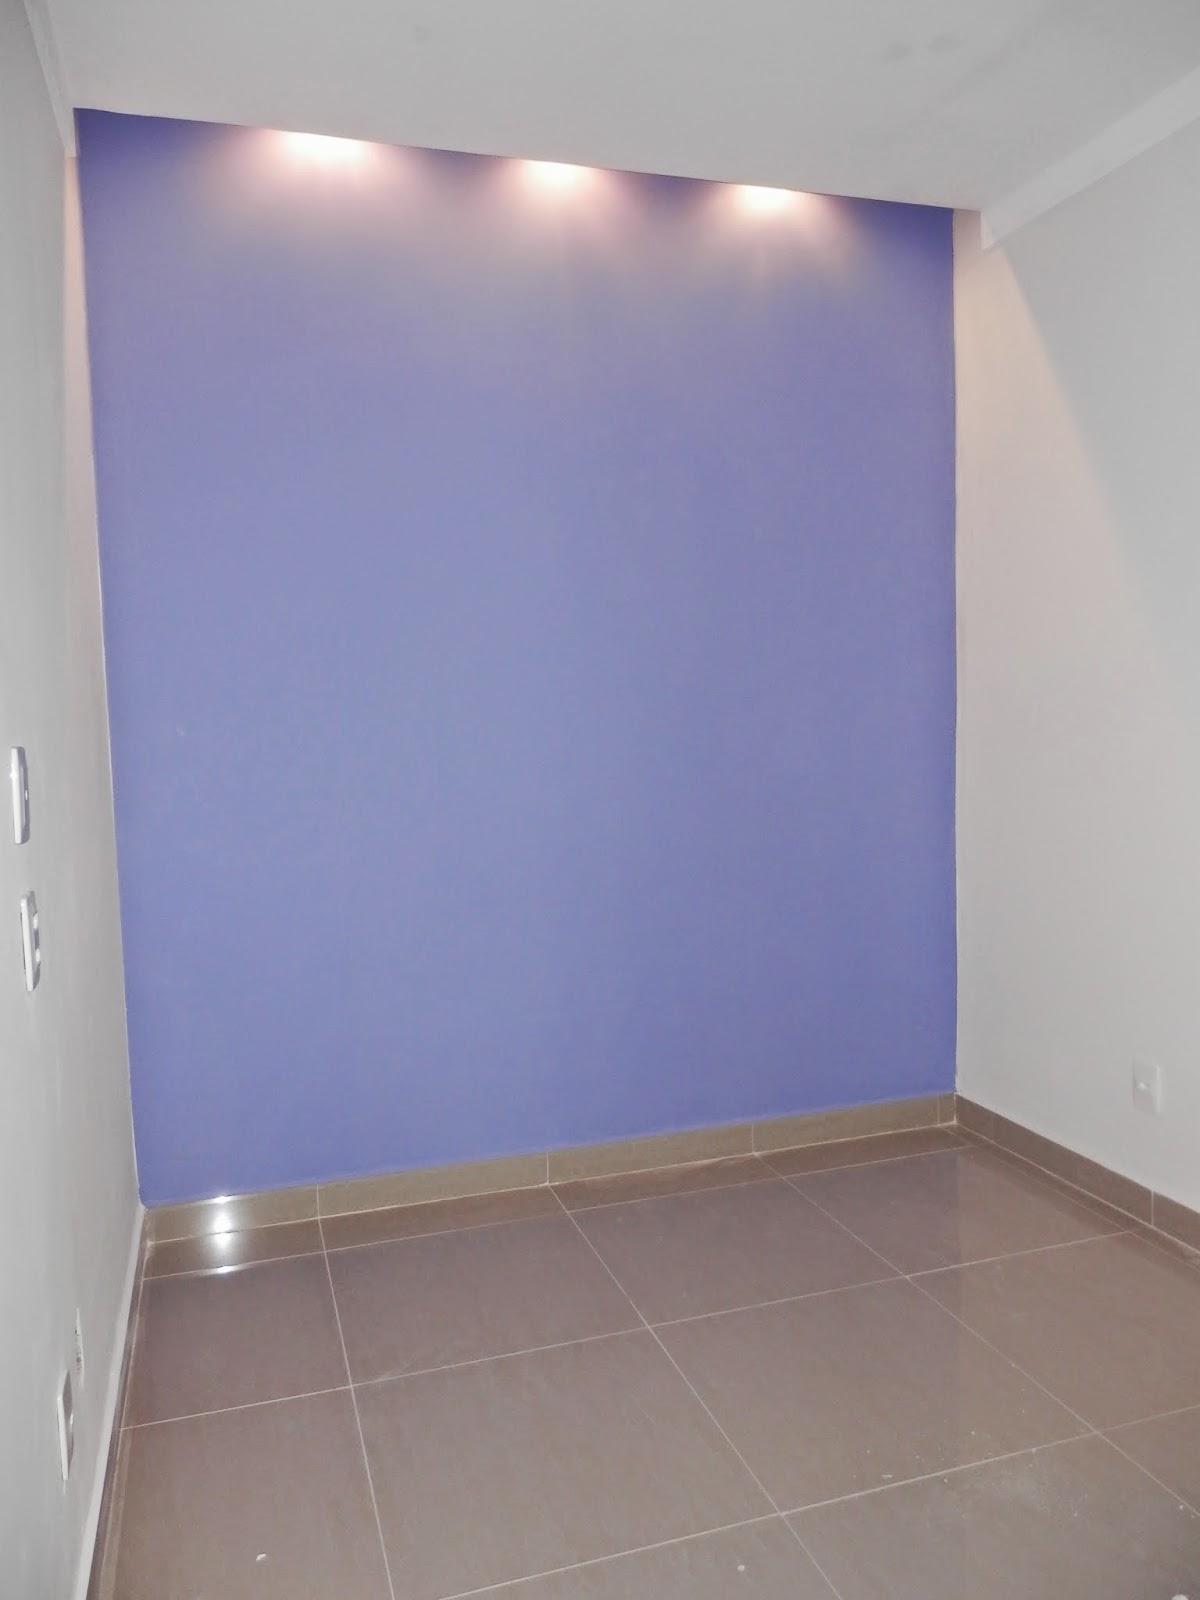 Cor lil s para quarto com piso barato para quarto for Reforma piso barato